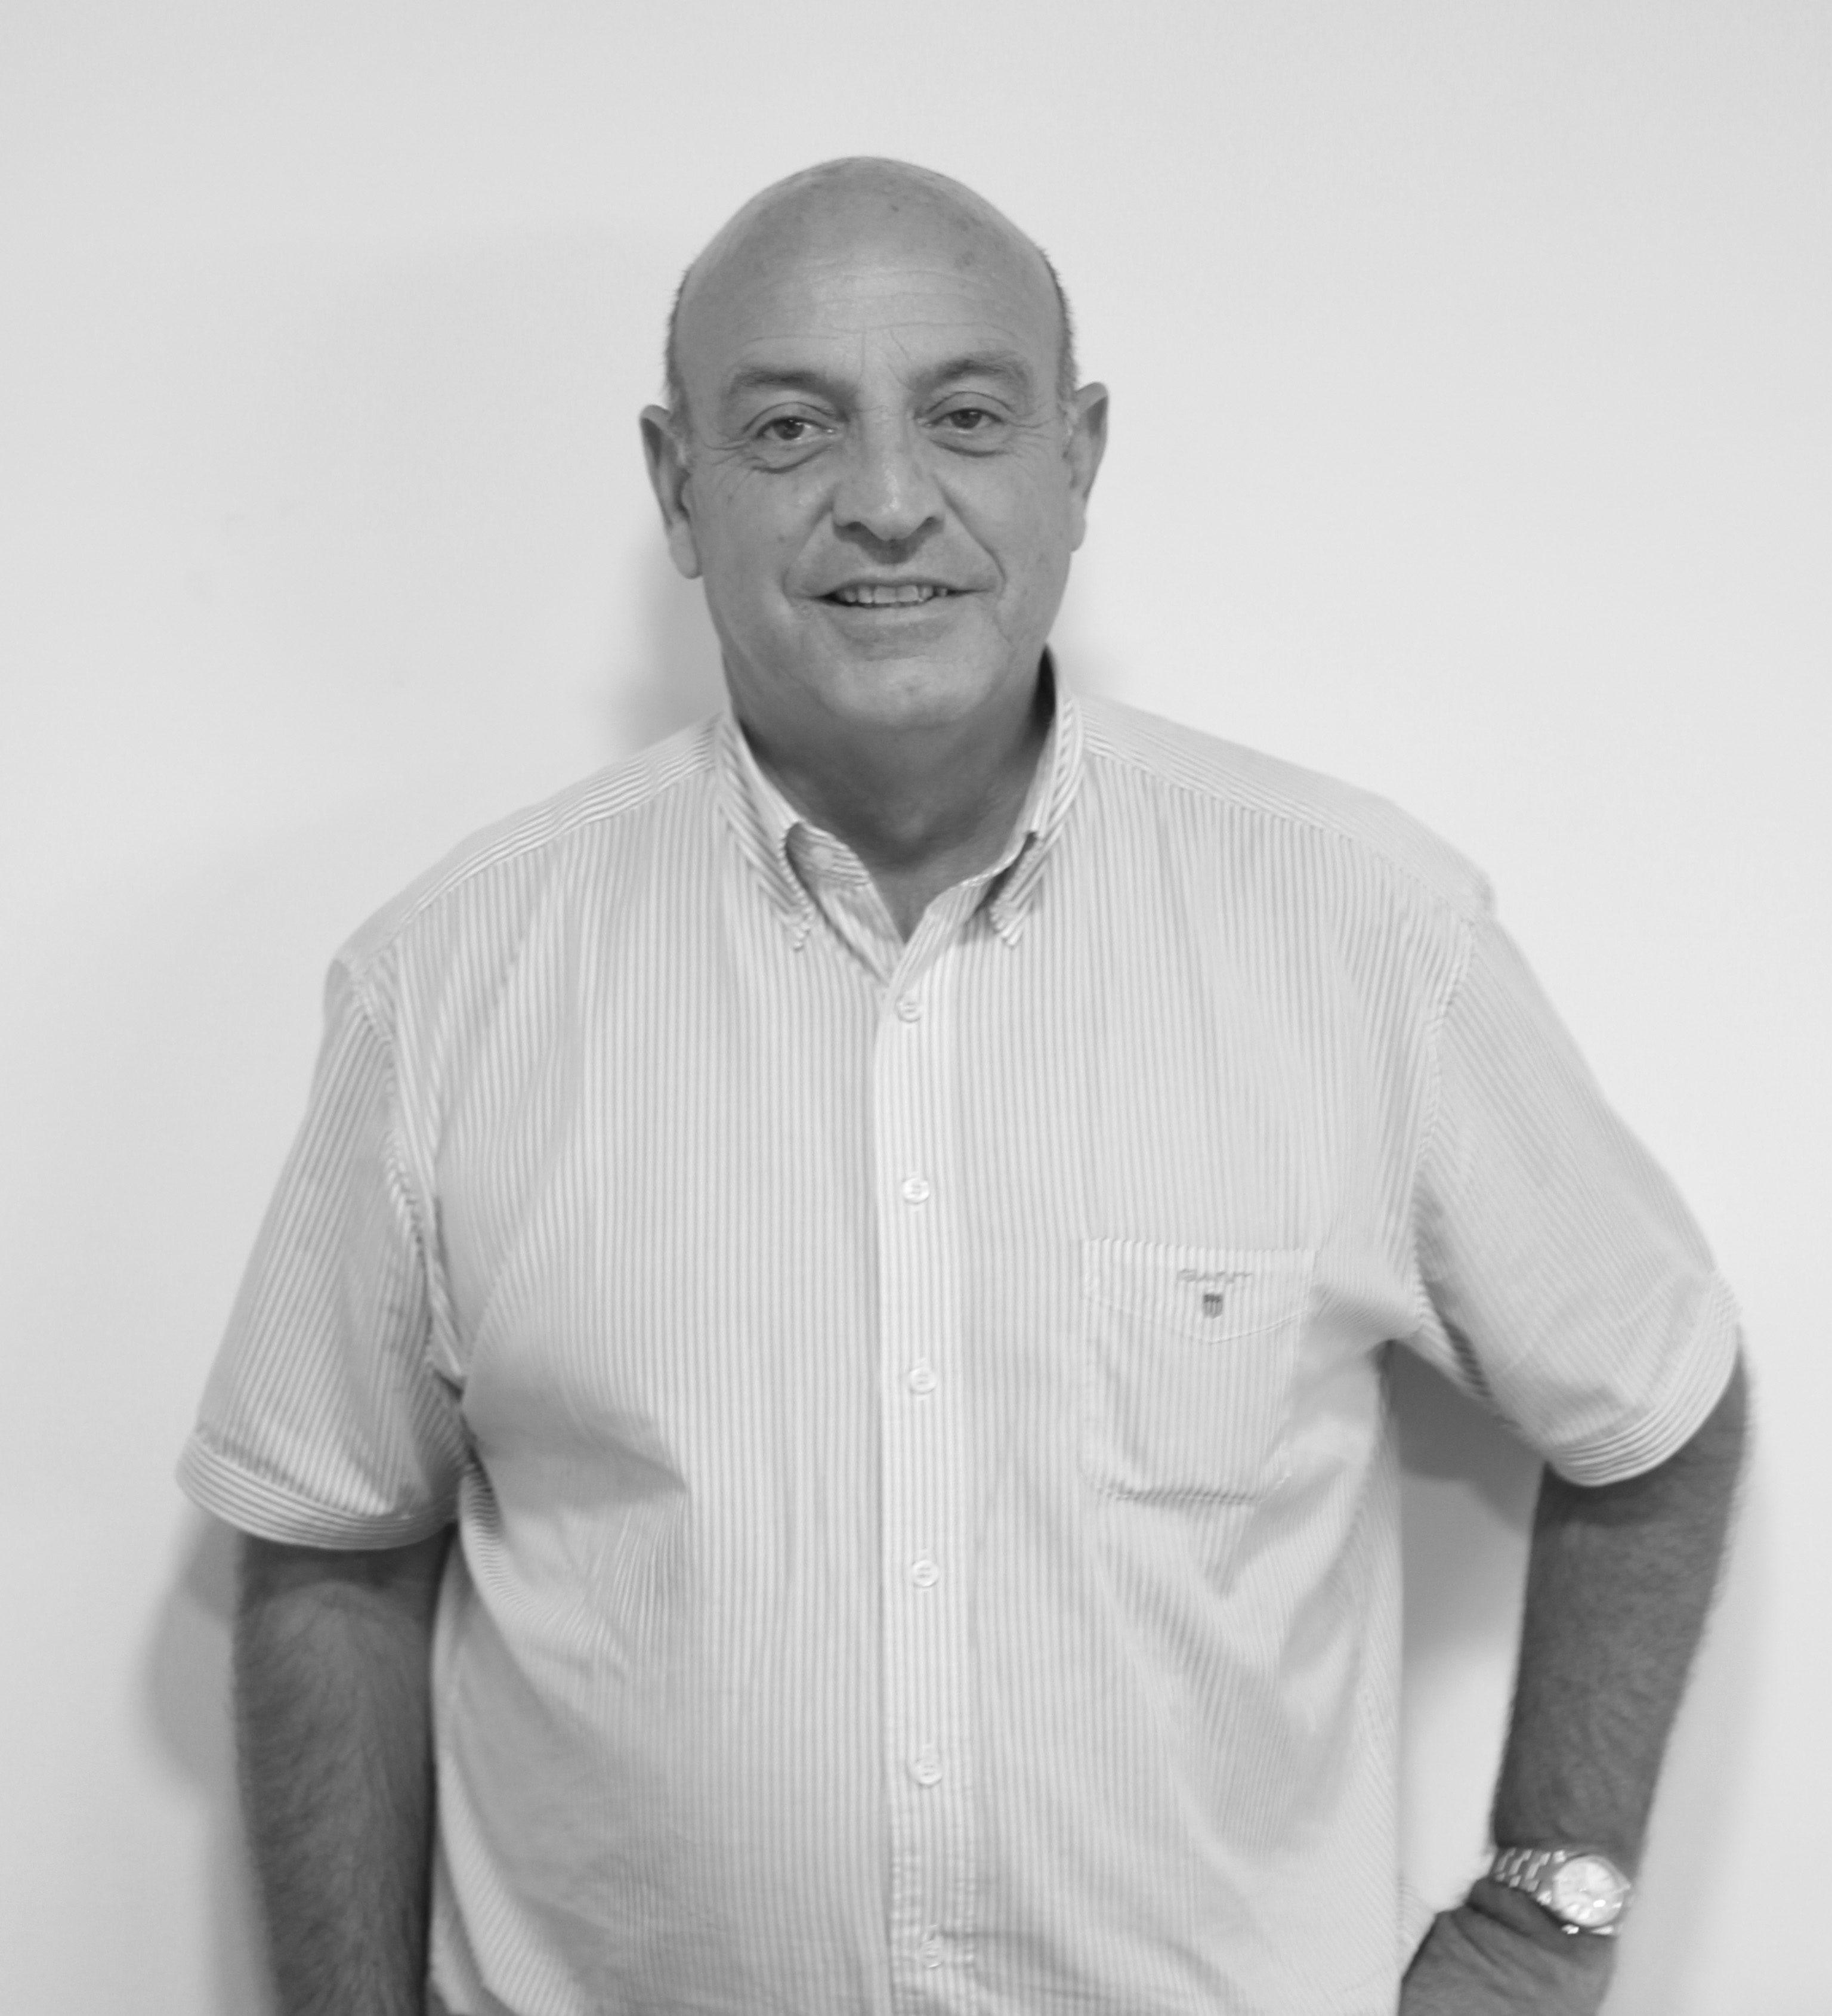 Savia proyectos foto blanco y negro Juan Ferrer